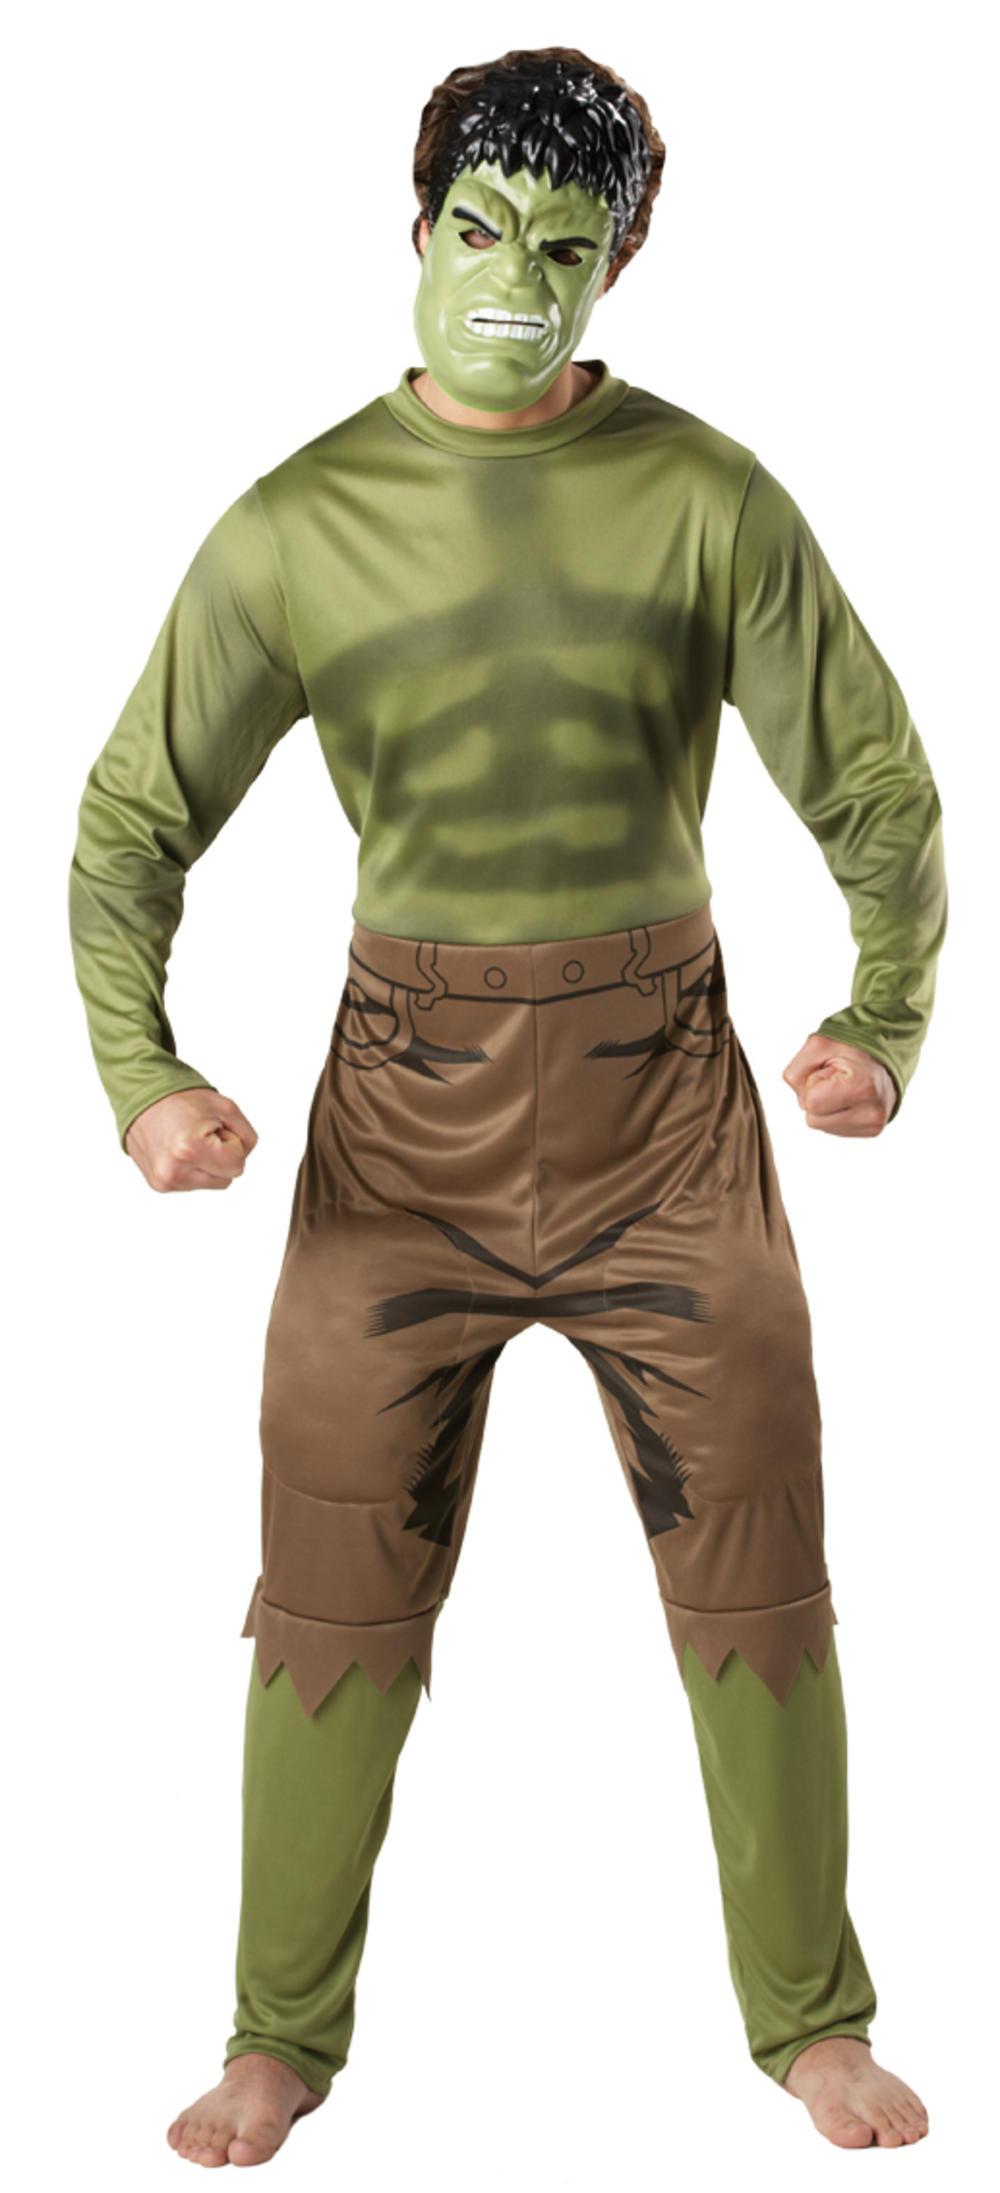 The Incredible Hulk Mens Fancy Dress Avengers Superhero Adult Costume + Mask